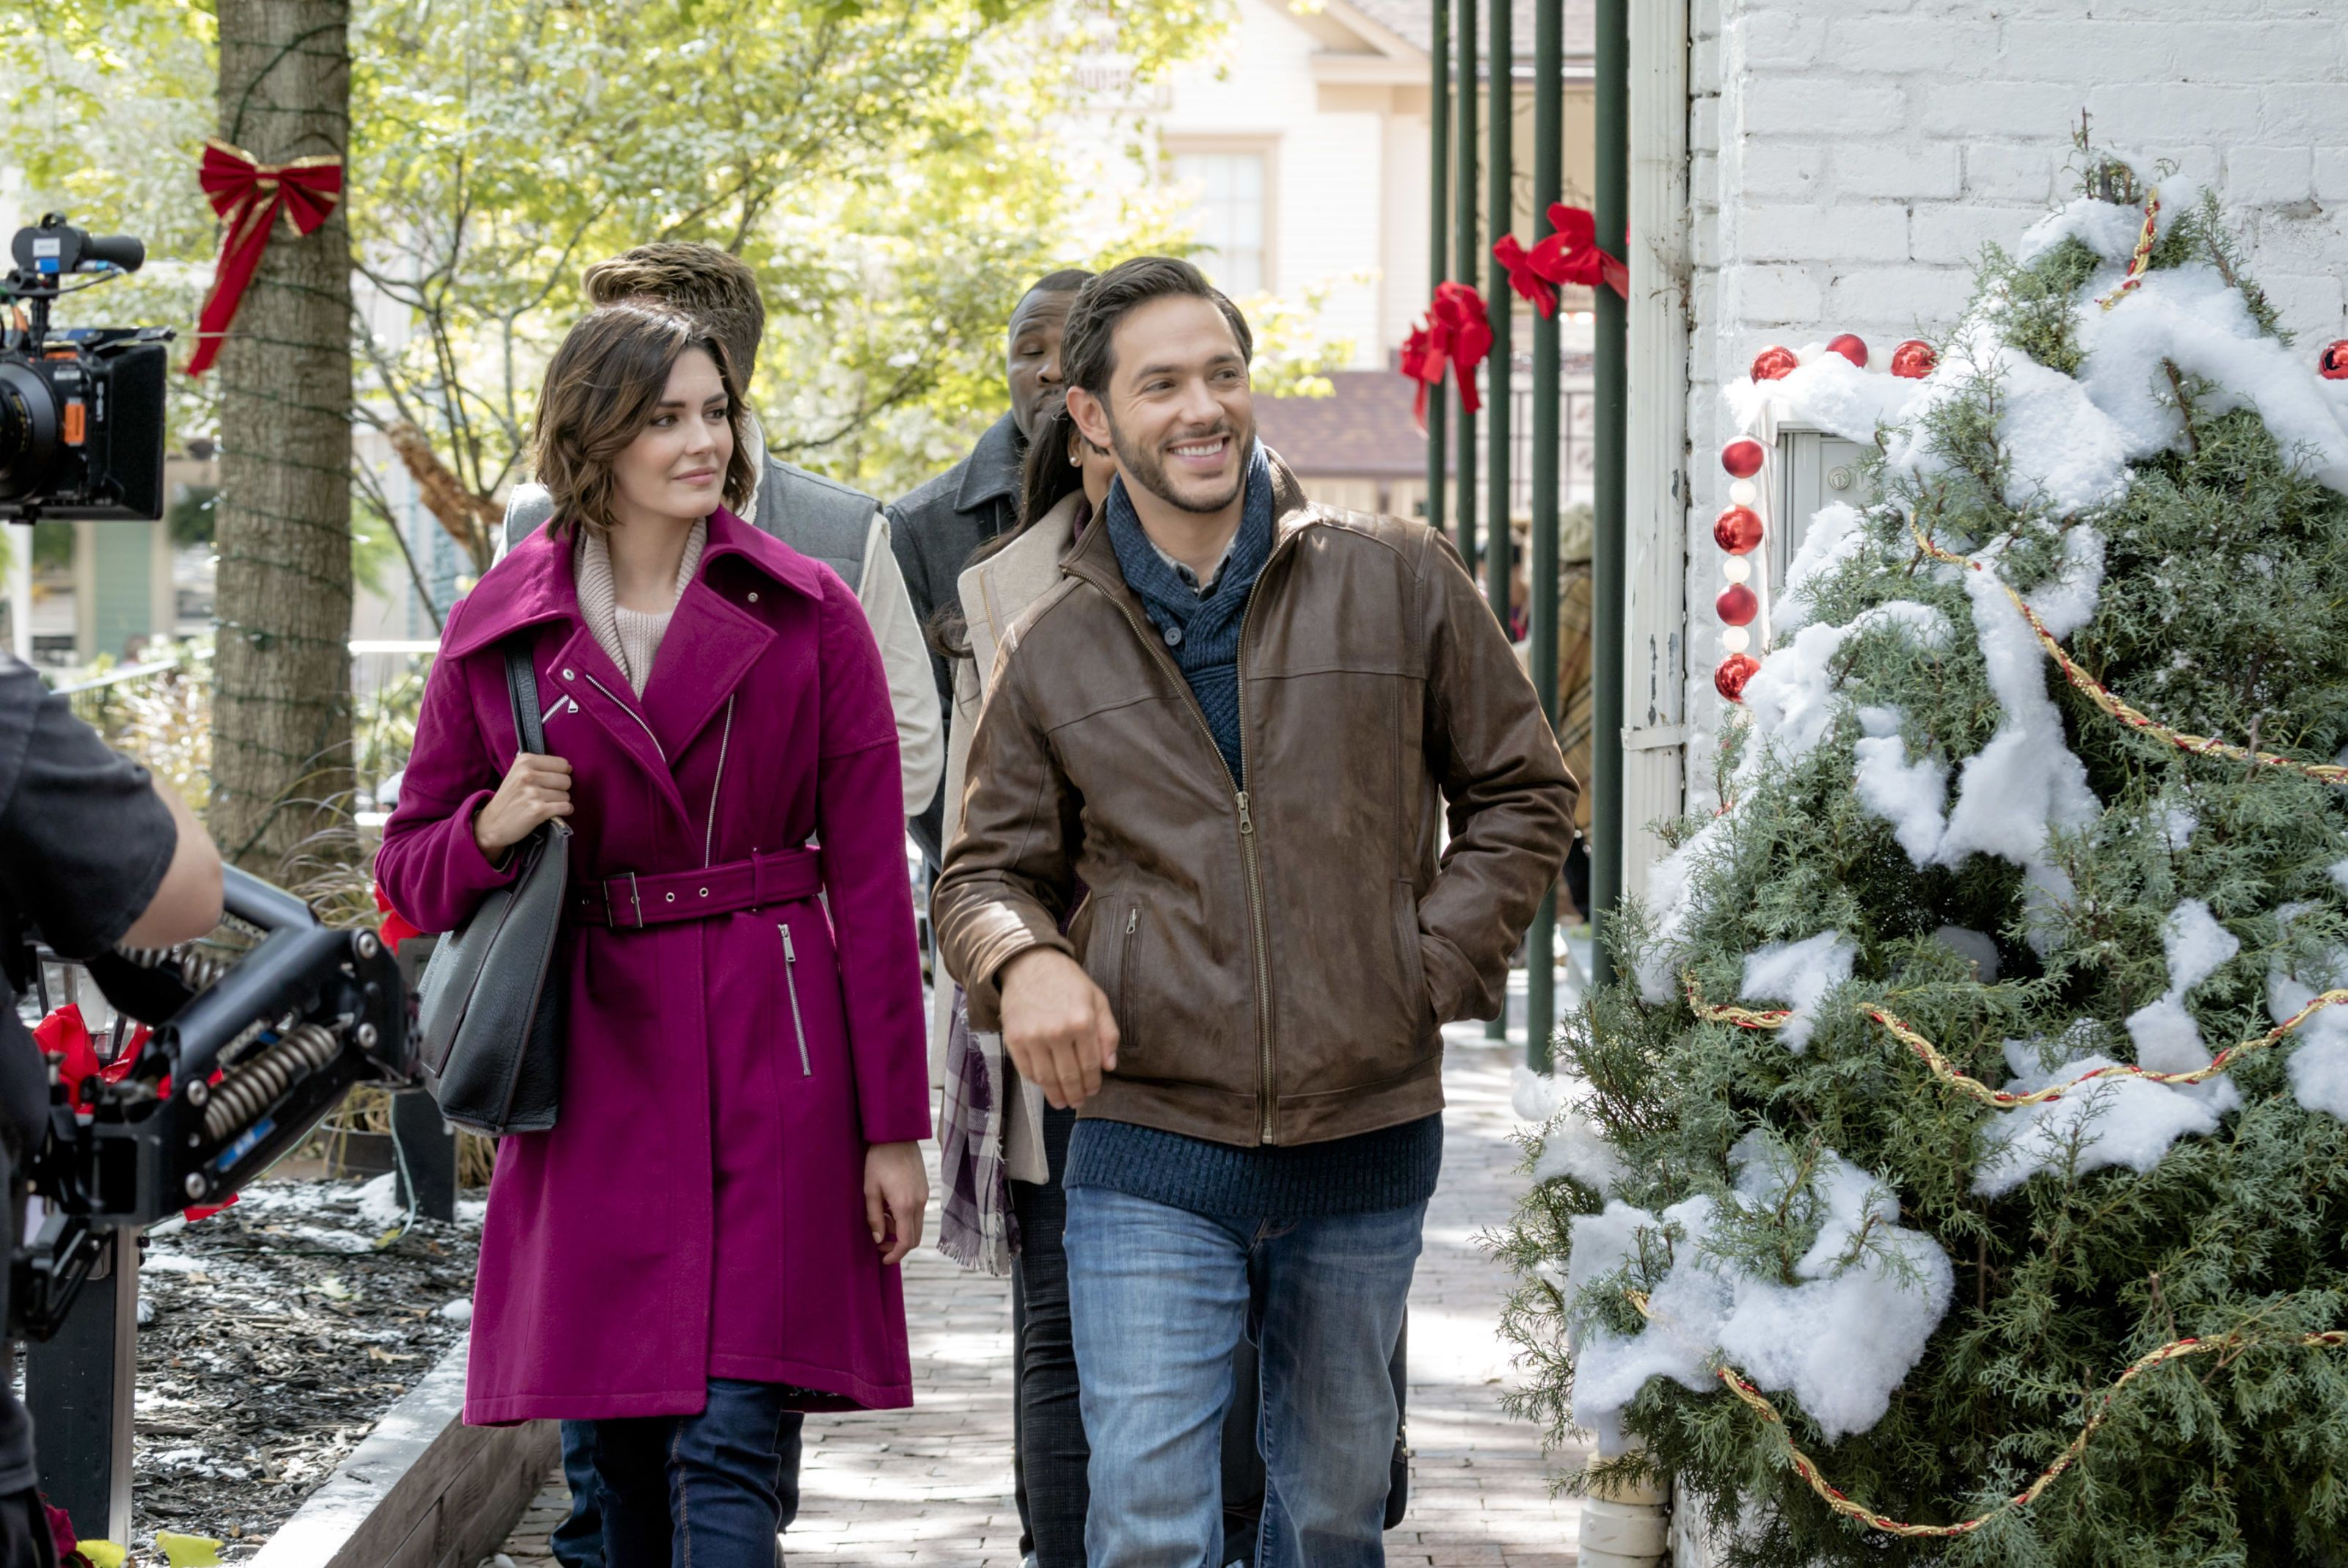 6 Hallmark Christmas Movies Filmed In Small Towns